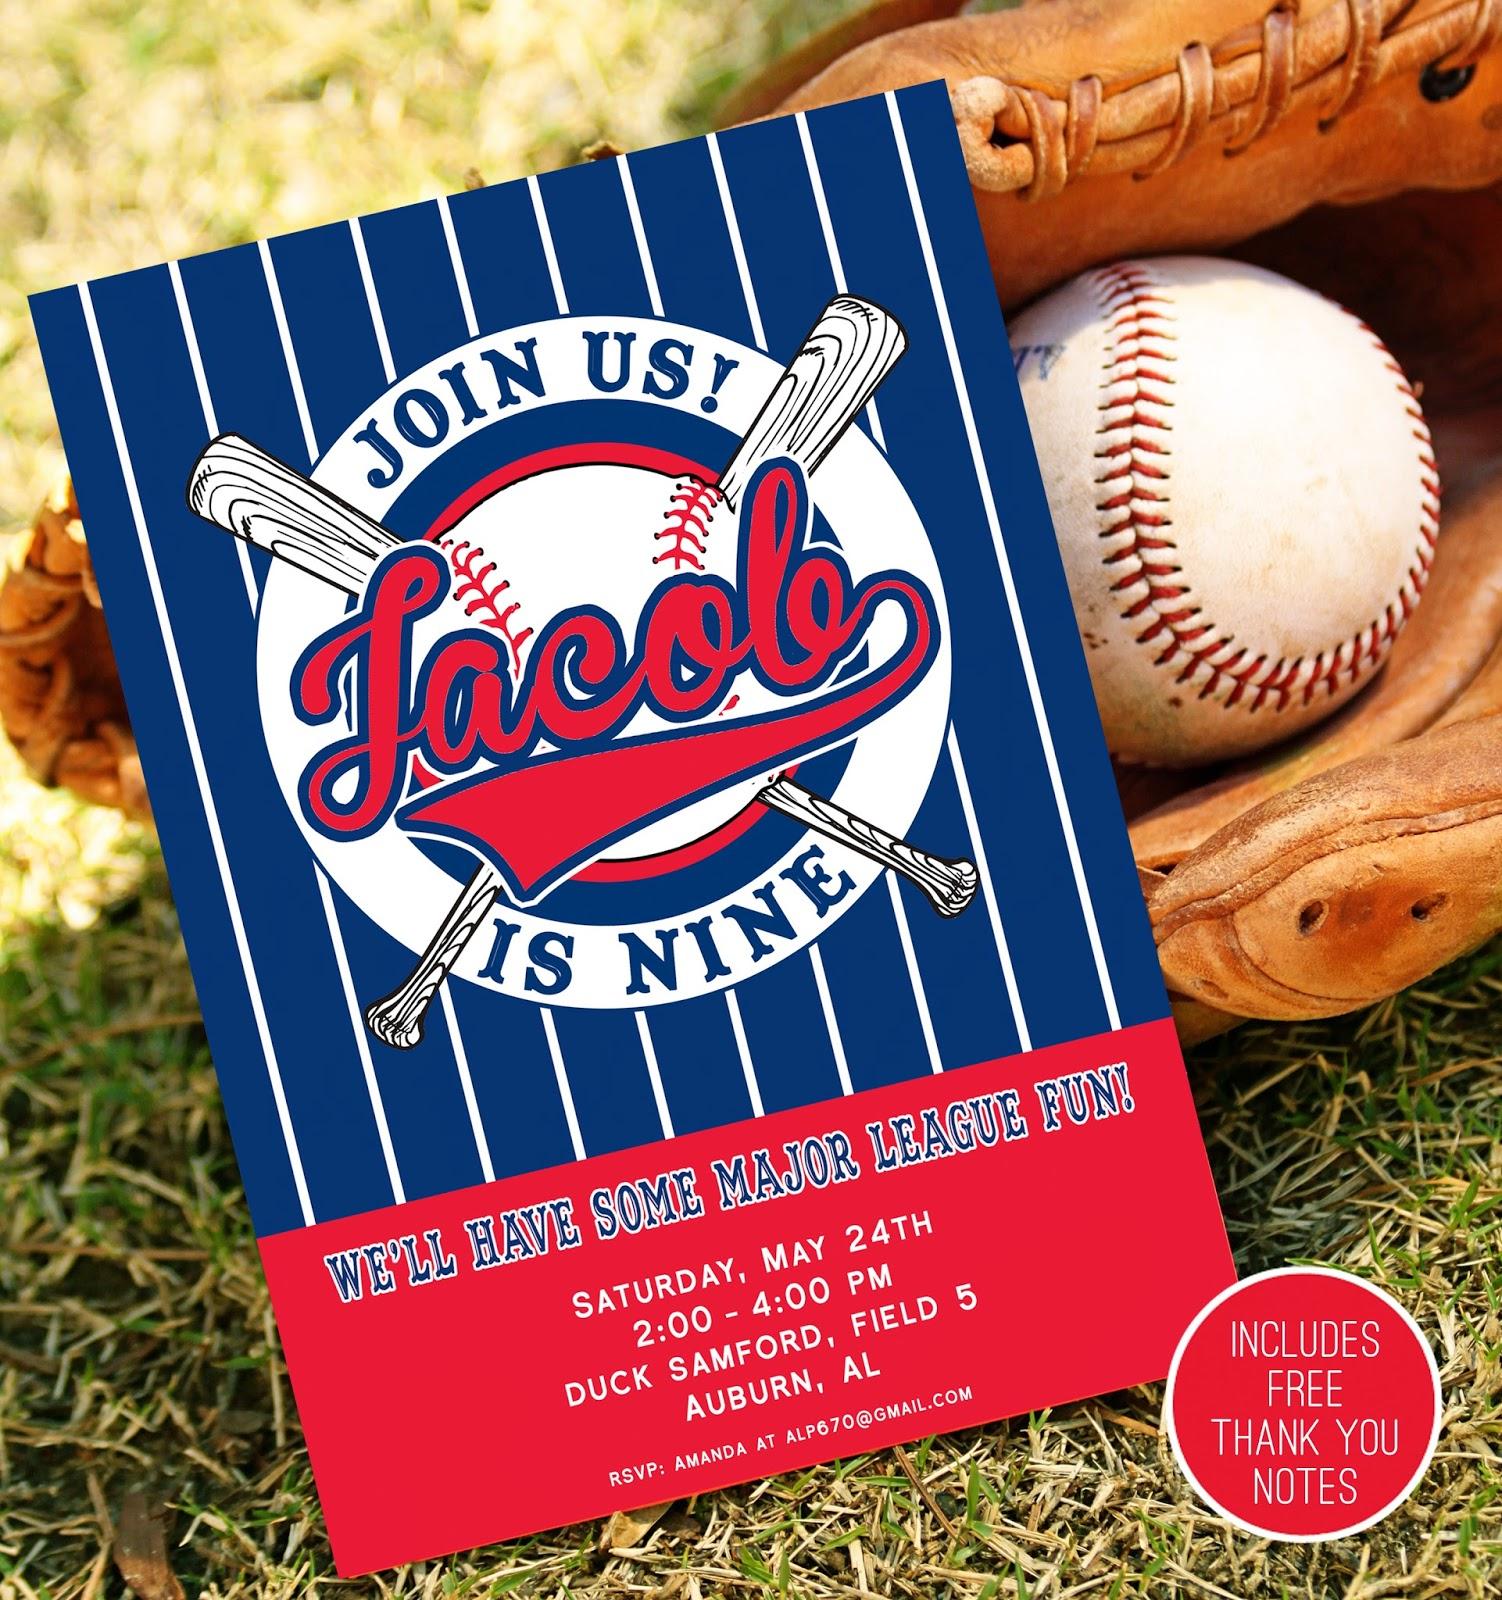 http://2.bp.blogspot.com/-JHVt5FVO0eY/U7v81_wJyjI/AAAAAAAALu0/NeGh4AHXq5s/s1600/baseball+invite+etsy.jpg